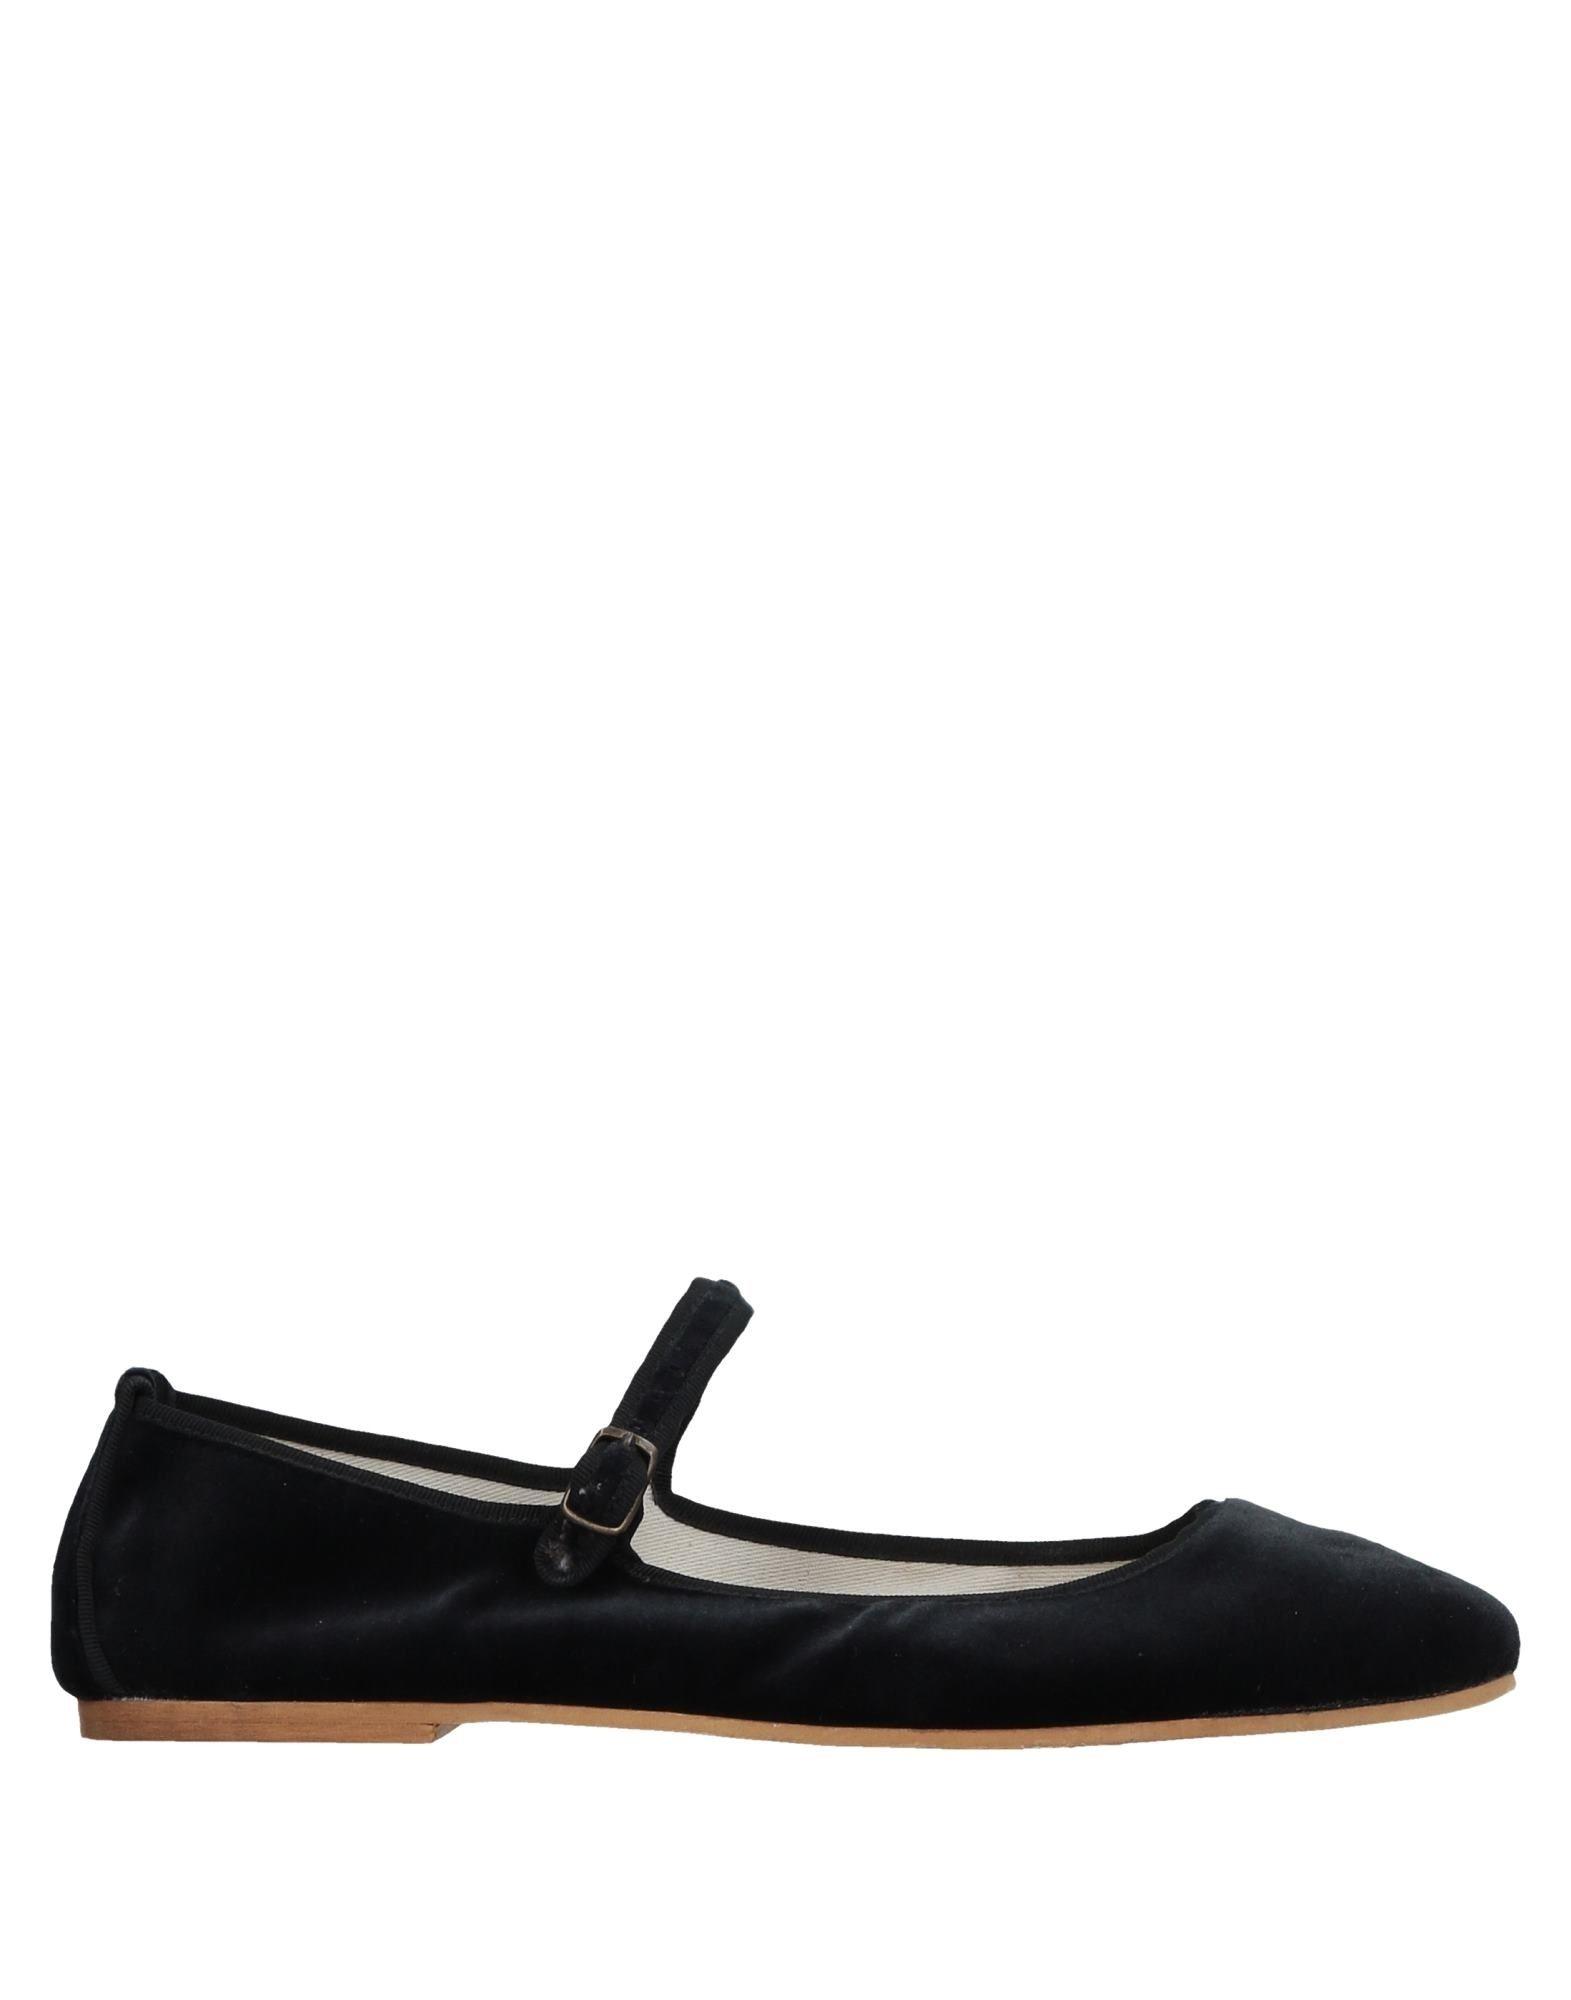 Gia Couture Ballerinas  Damen  Ballerinas 11522203JK Gute Qualität beliebte Schuhe 6a1529